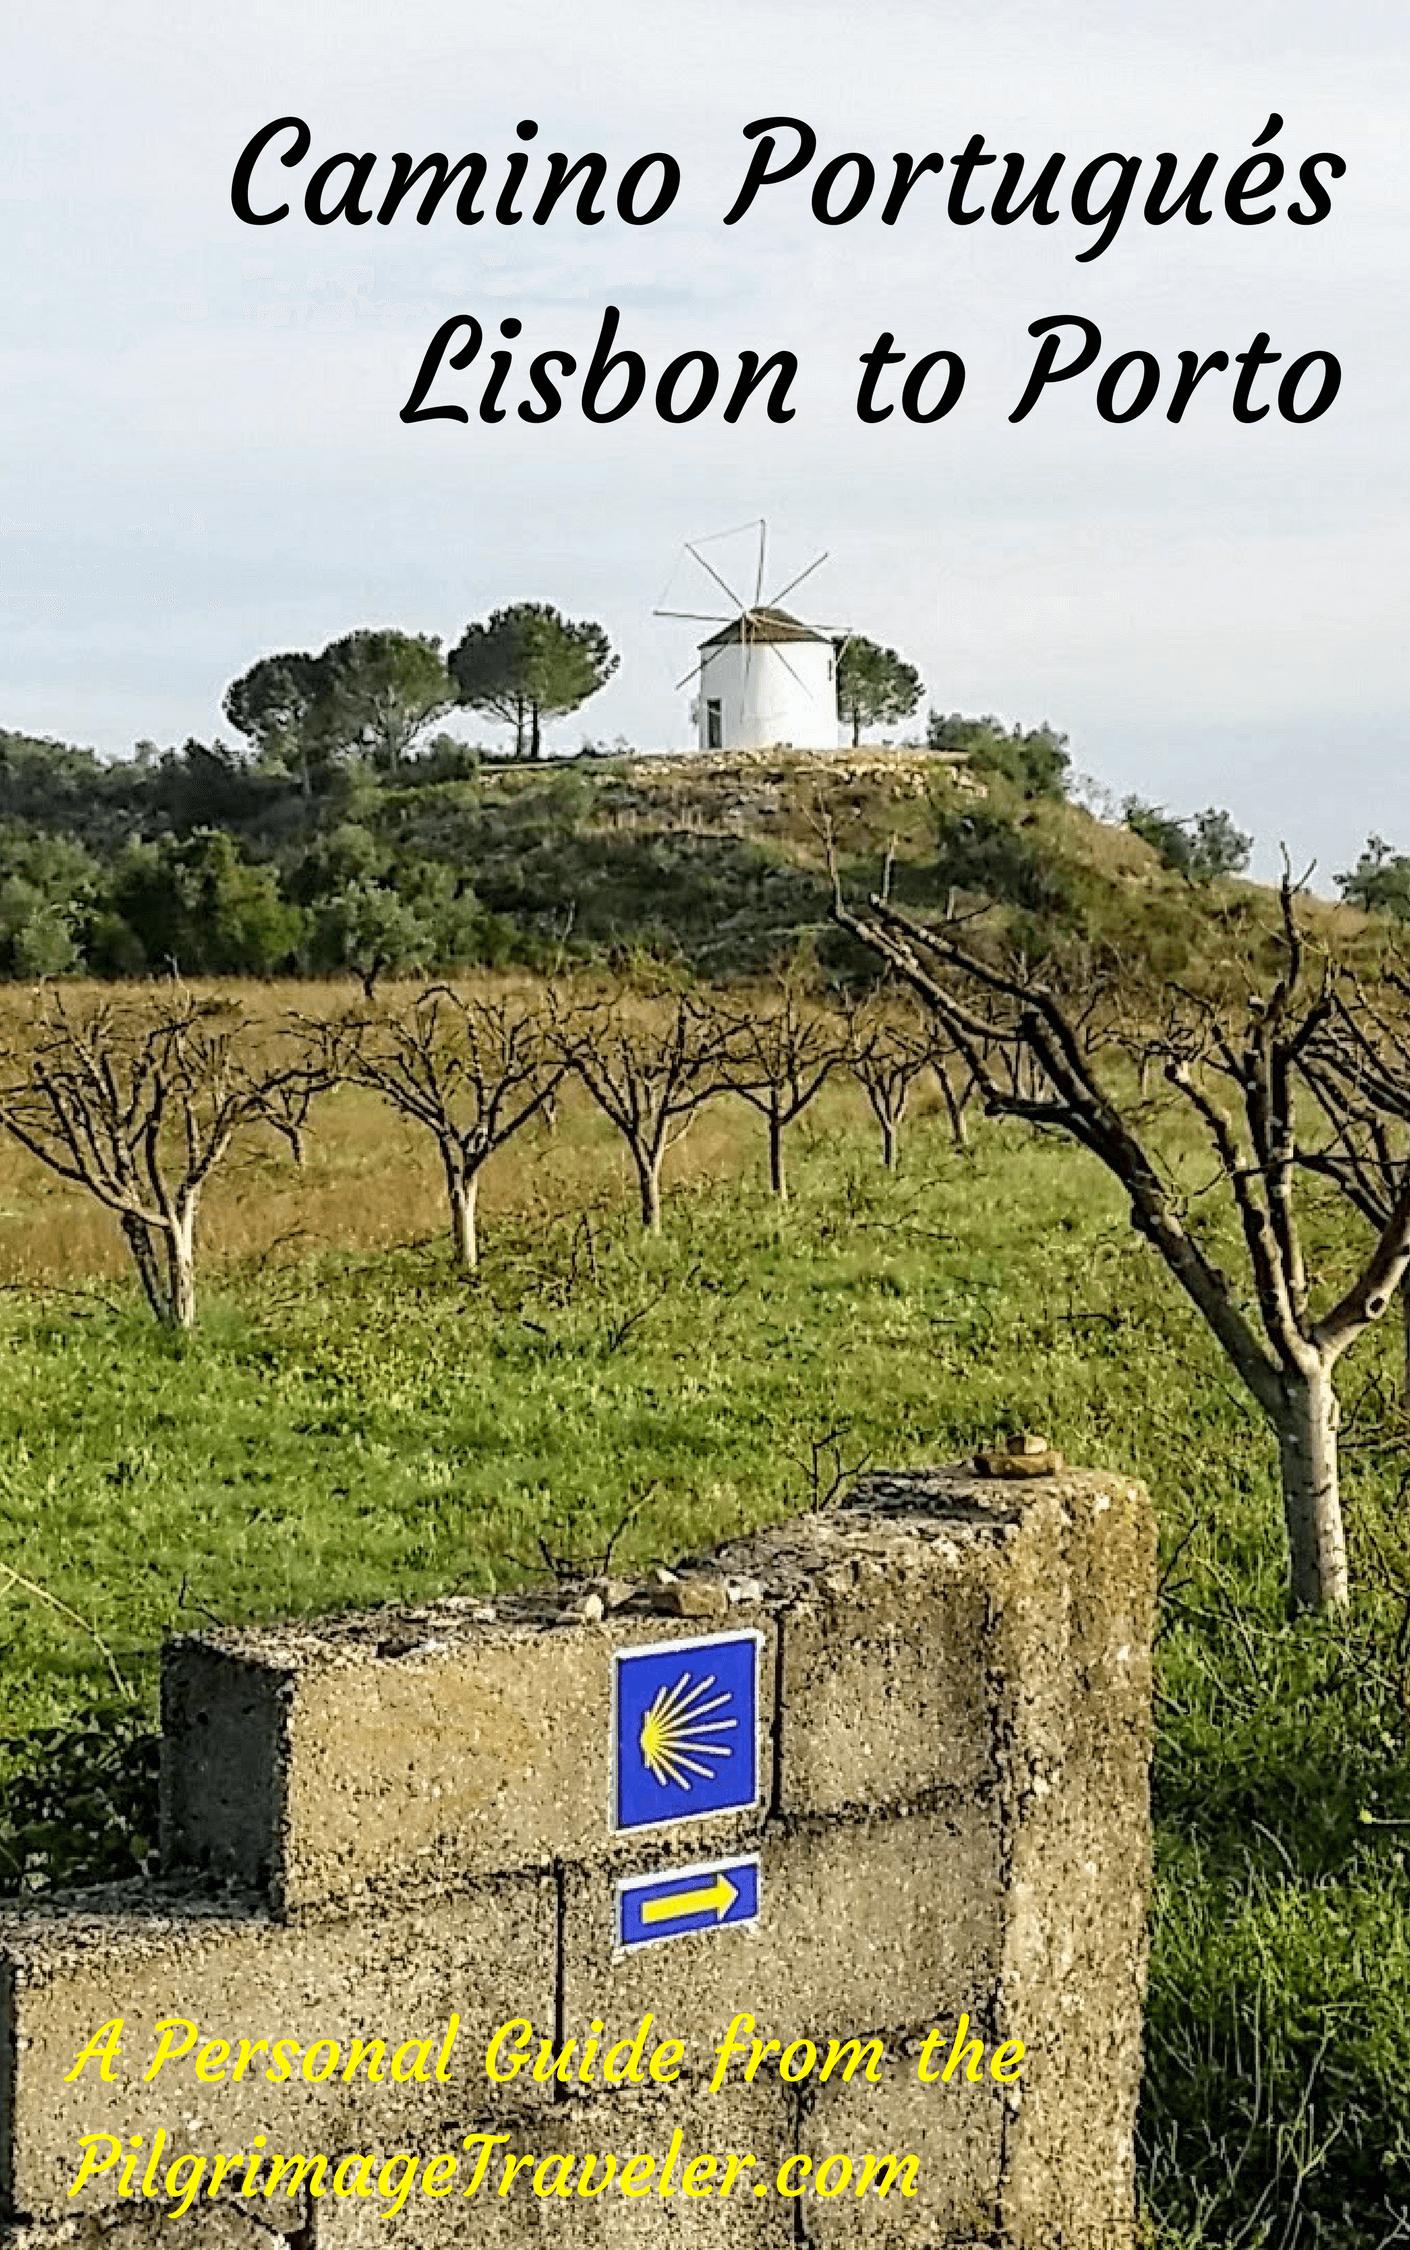 Camino Portugués Guide, Lisbon to Porto Downloadable EBook